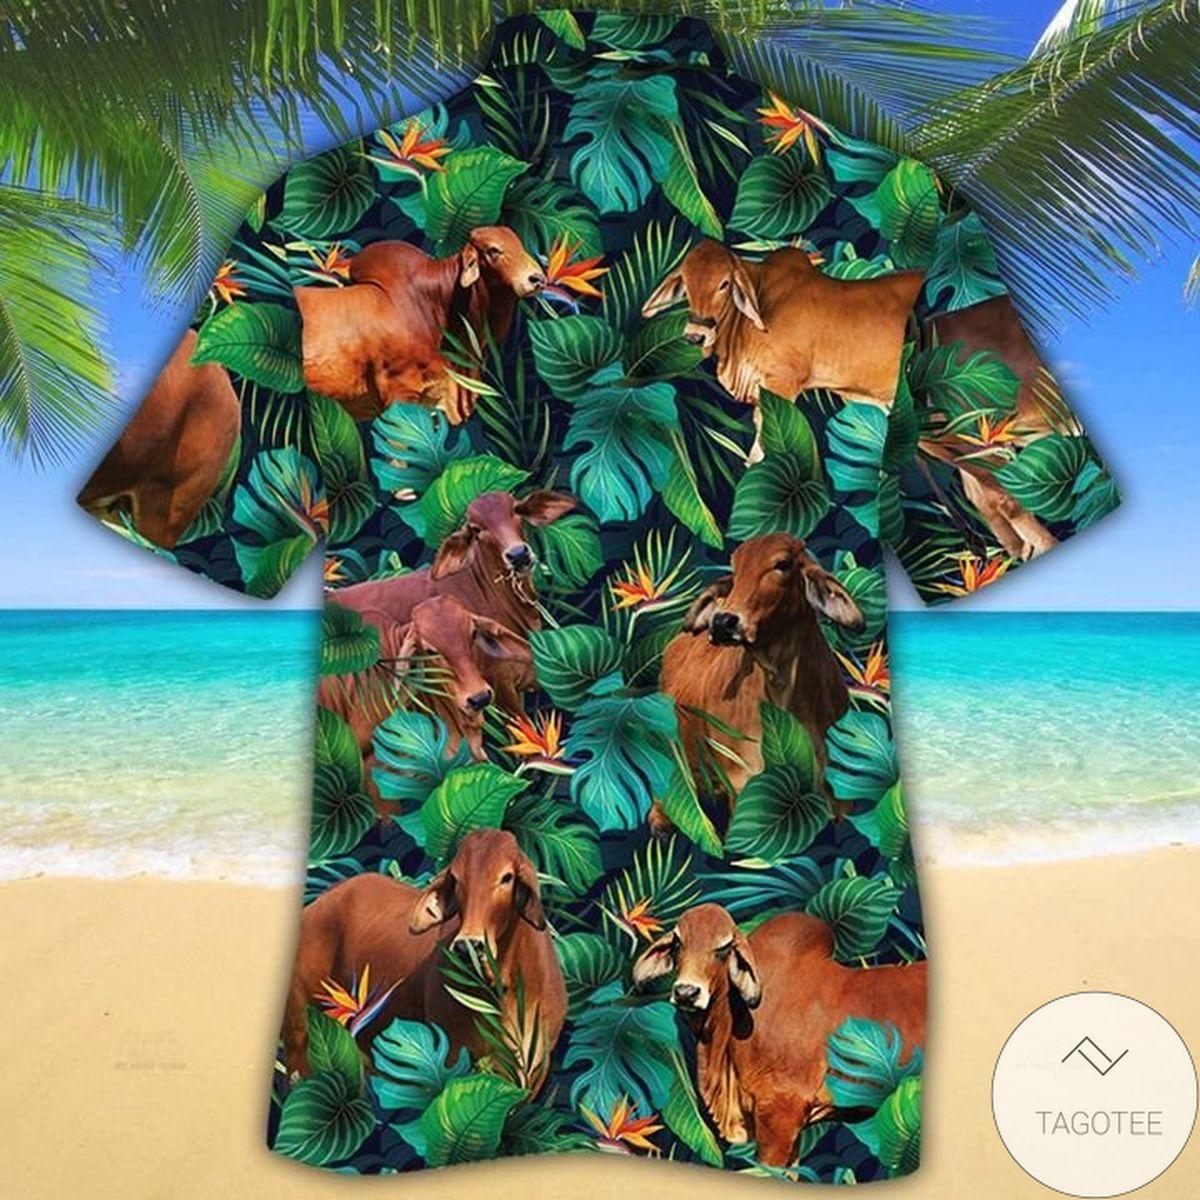 Amazing Red Brahman Cattle Lovers Tropical Leaves Hawaiian Shirt